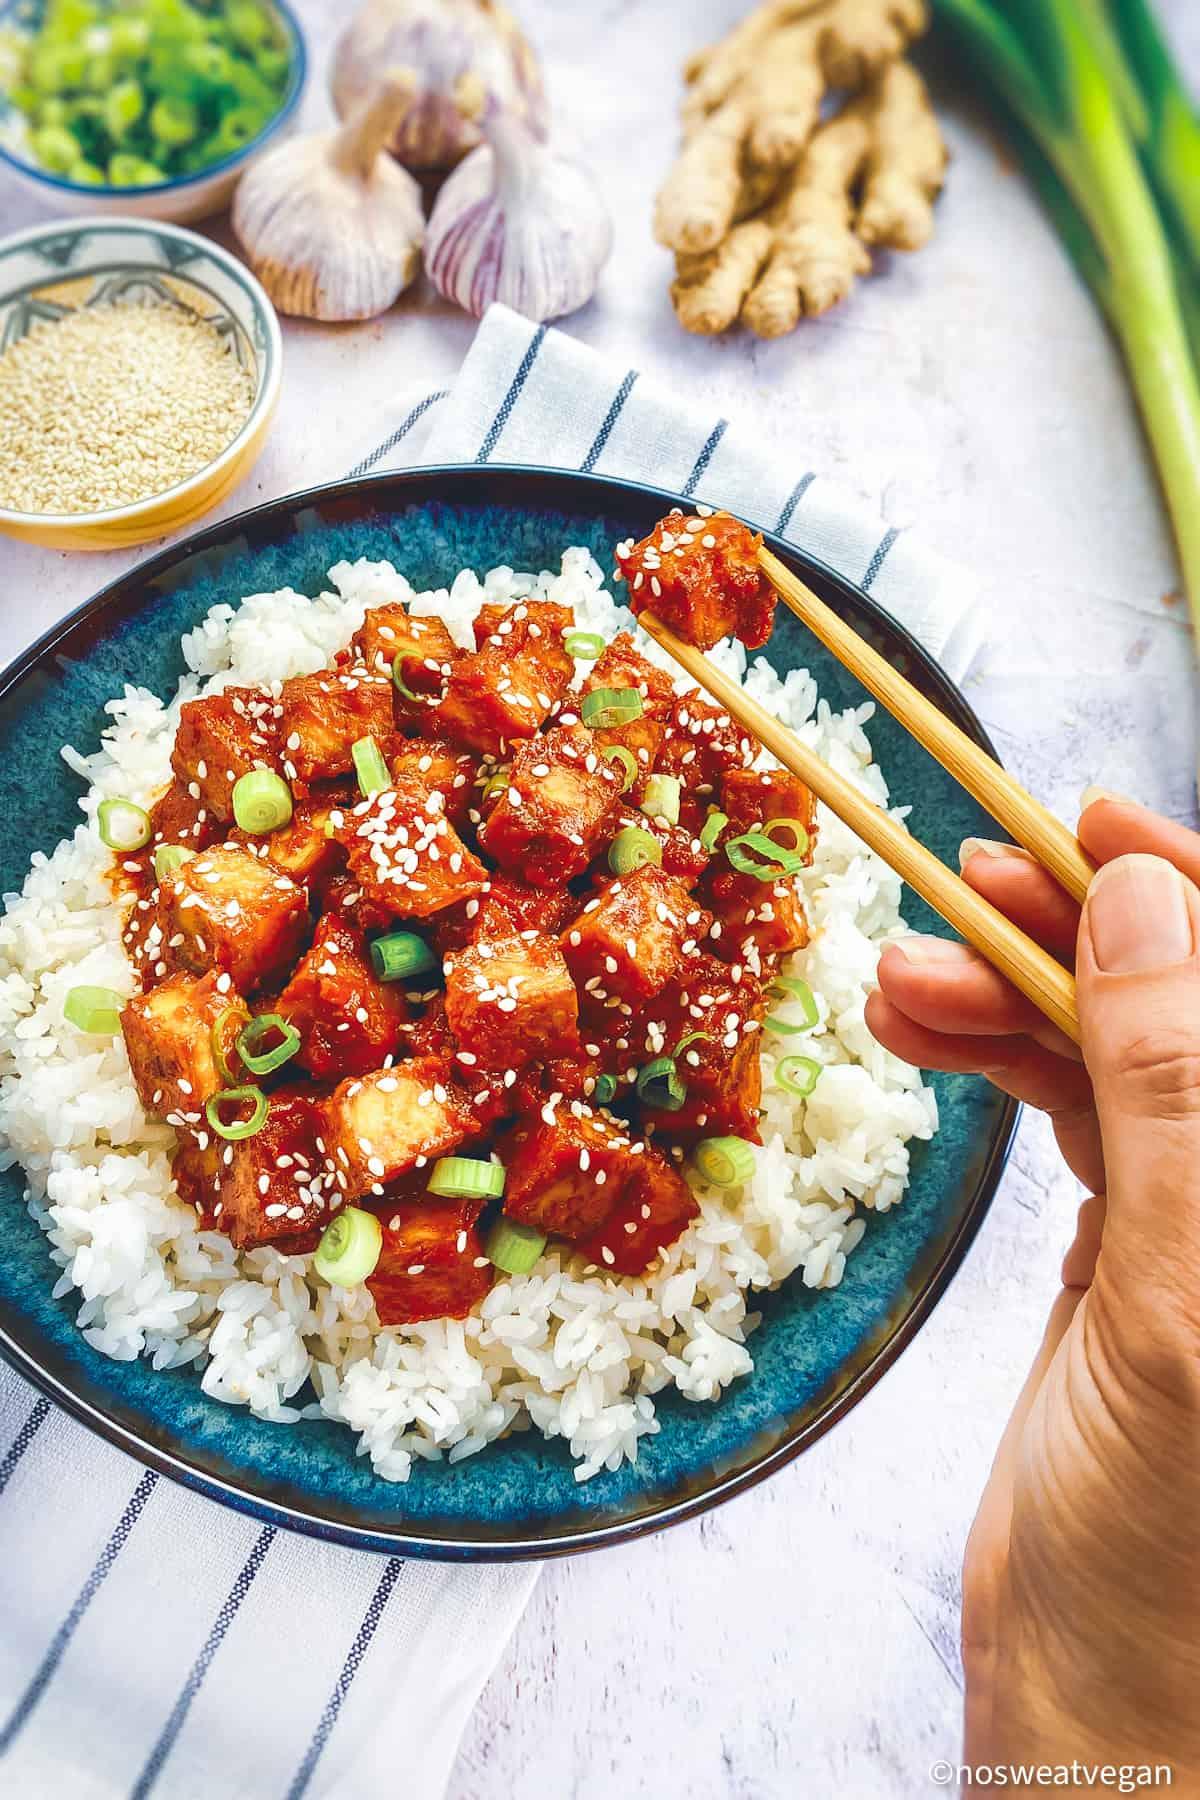 Hand with chopsticks picking up spicy Korean tofu.